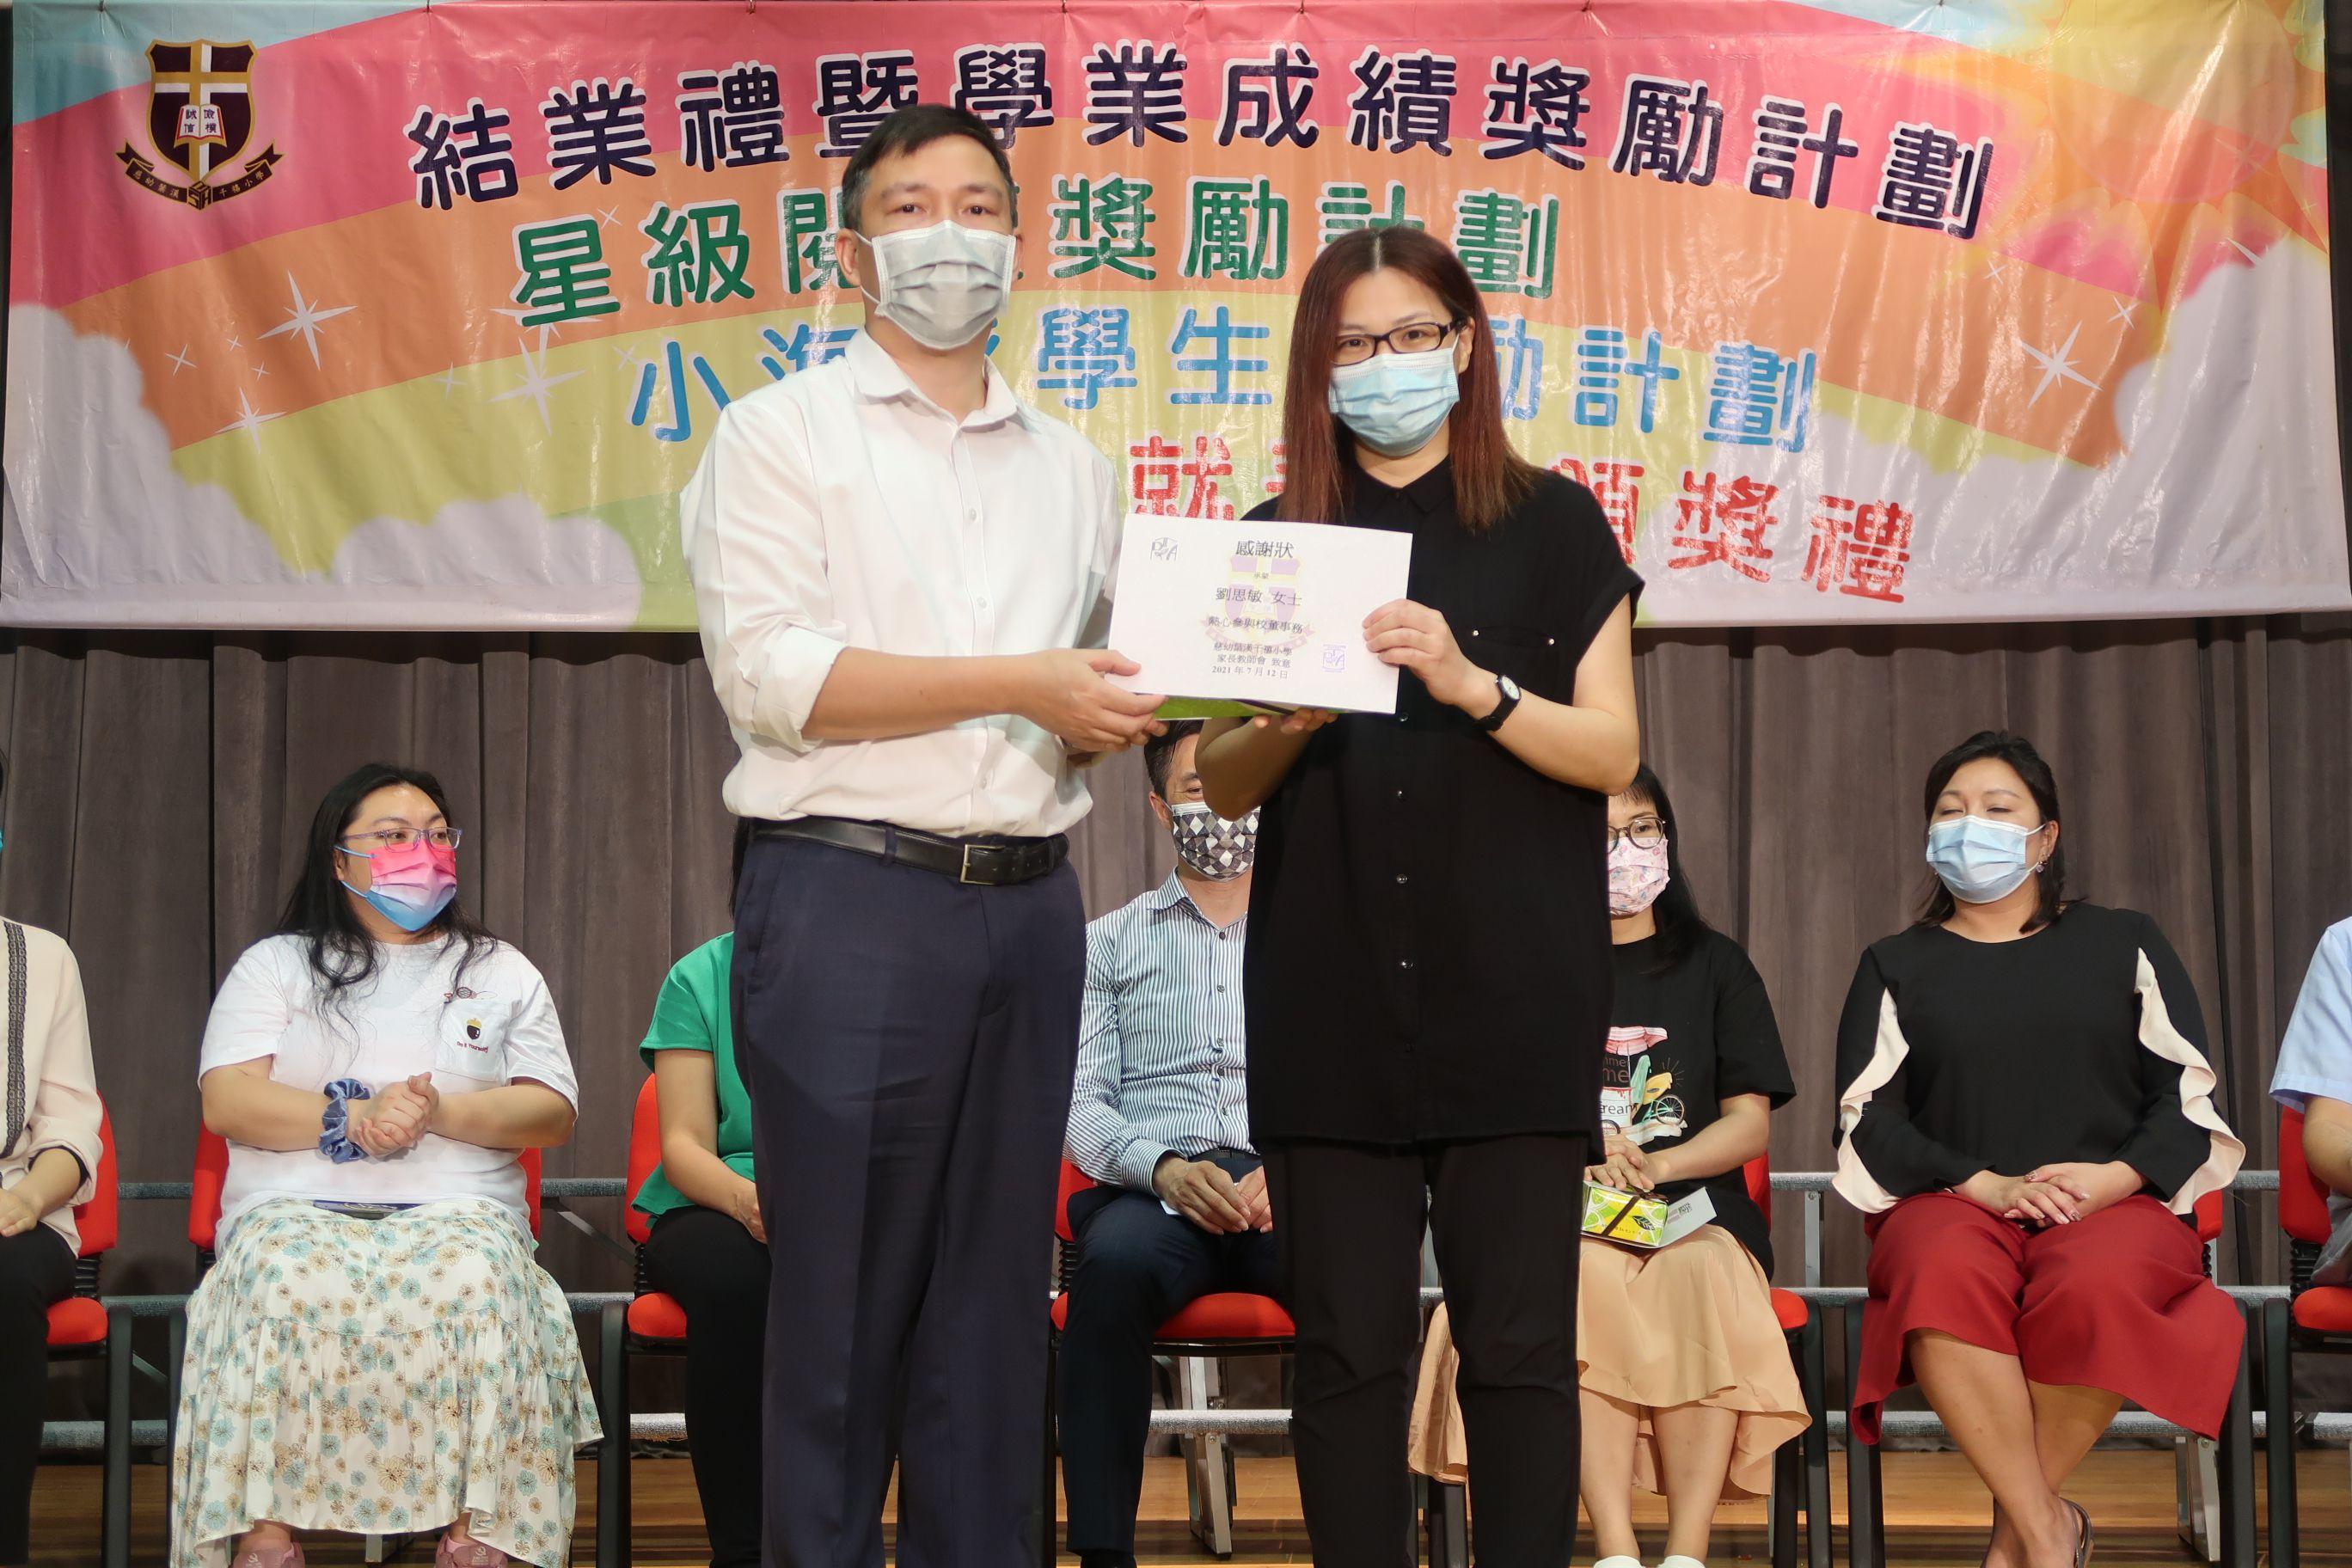 https://syh.edu.hk/sites/default/files/img_5970.jpg